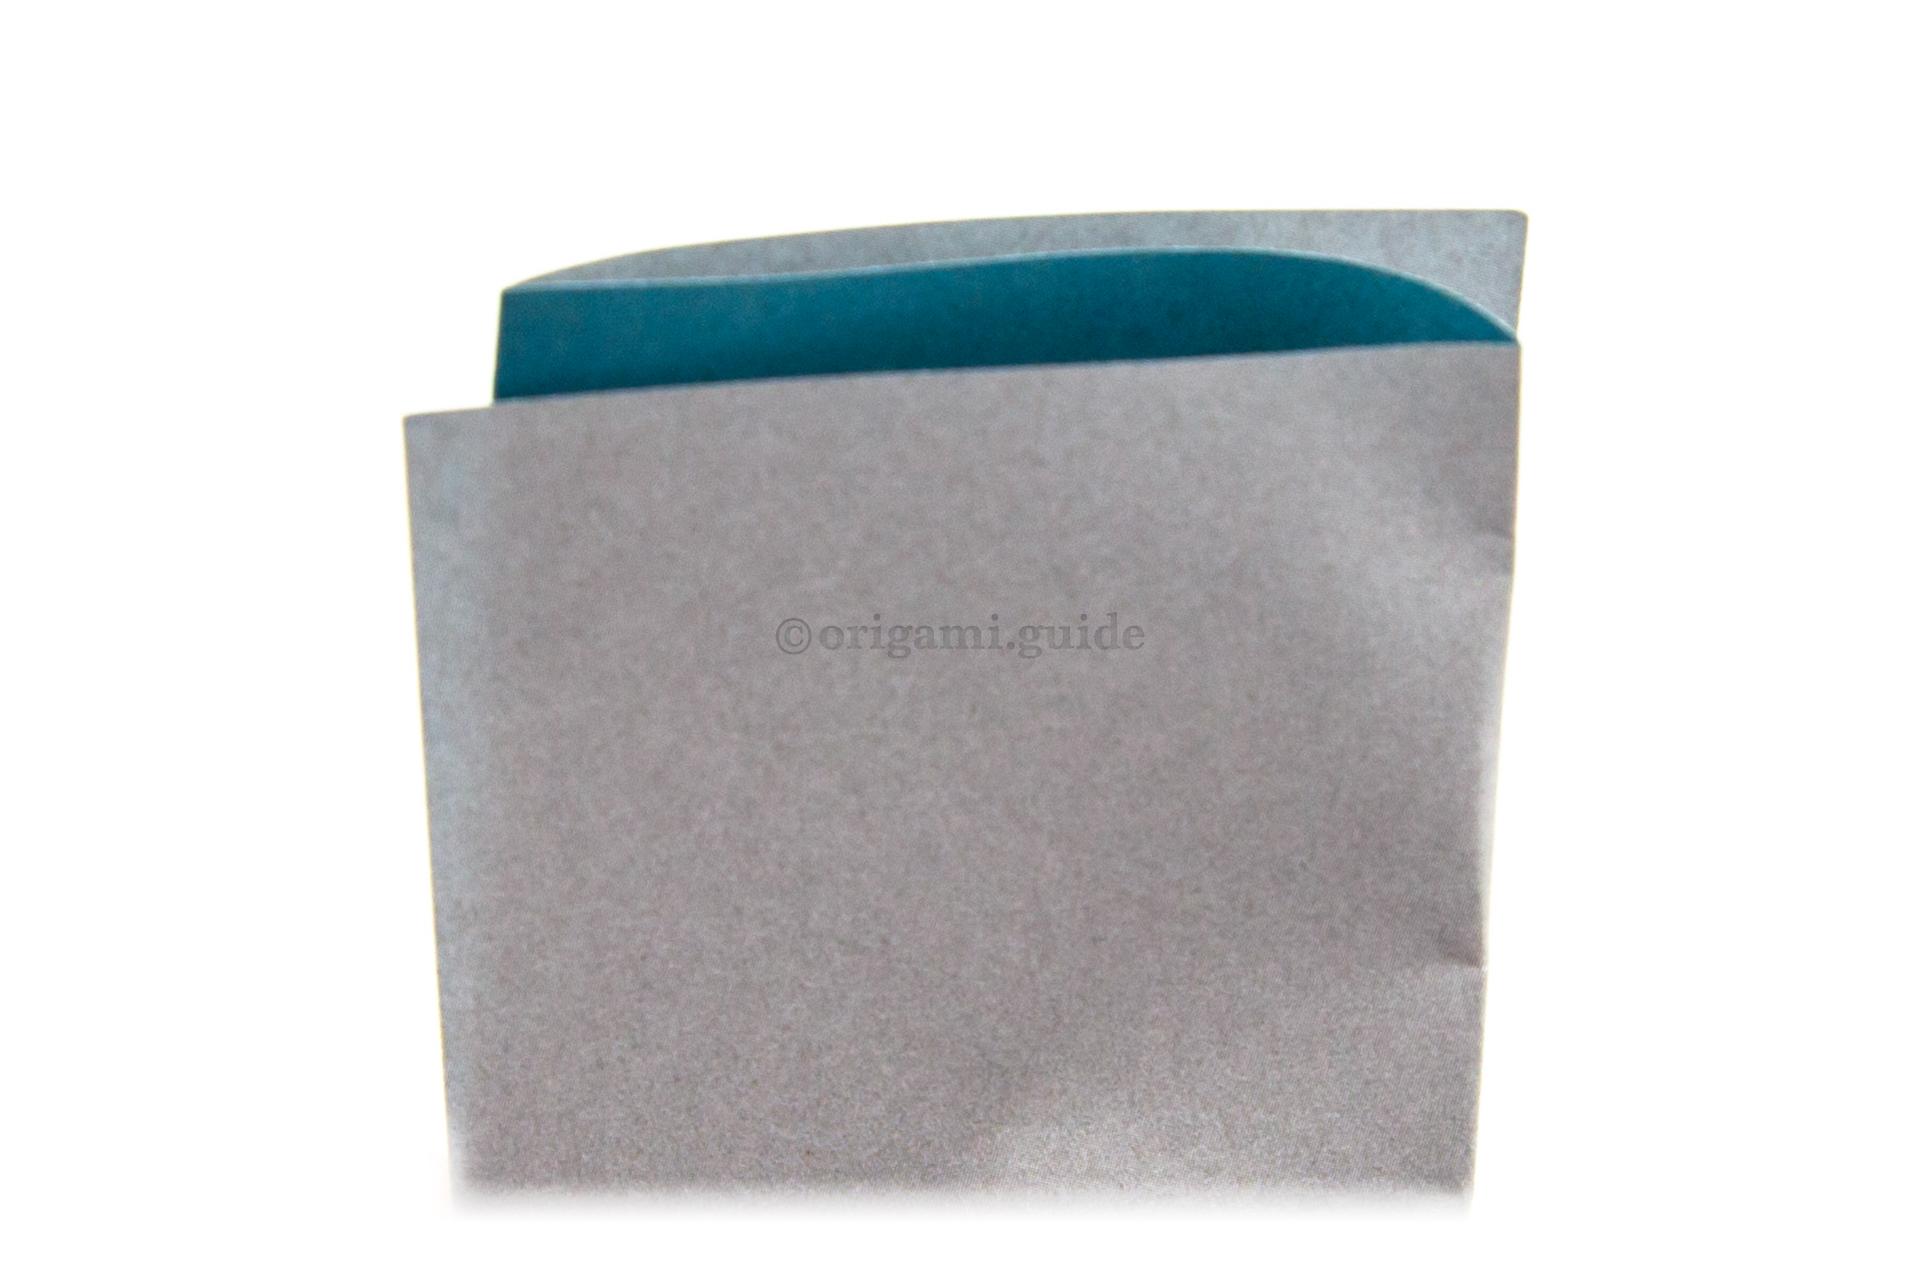 Contact us at Origami-Instructions.com | 1280x1920